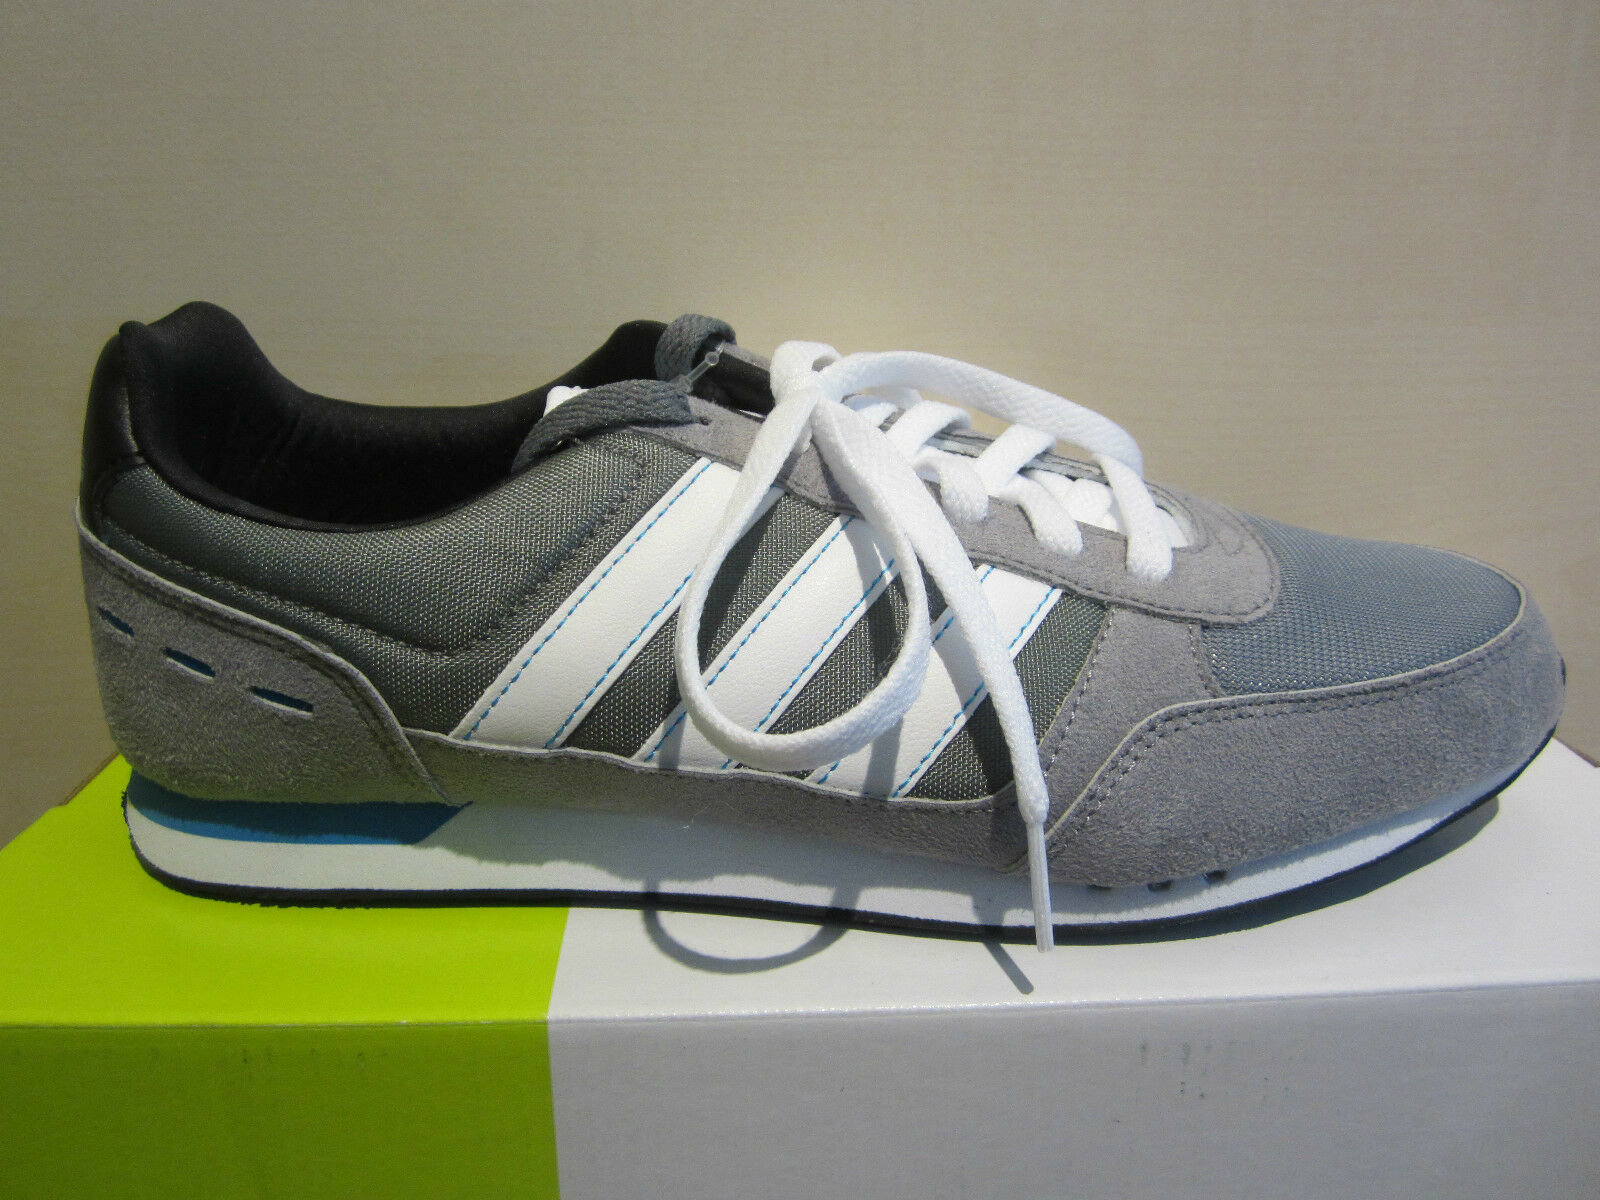 Adidas Lace Up / Sneaker Grau / Weiß NEU